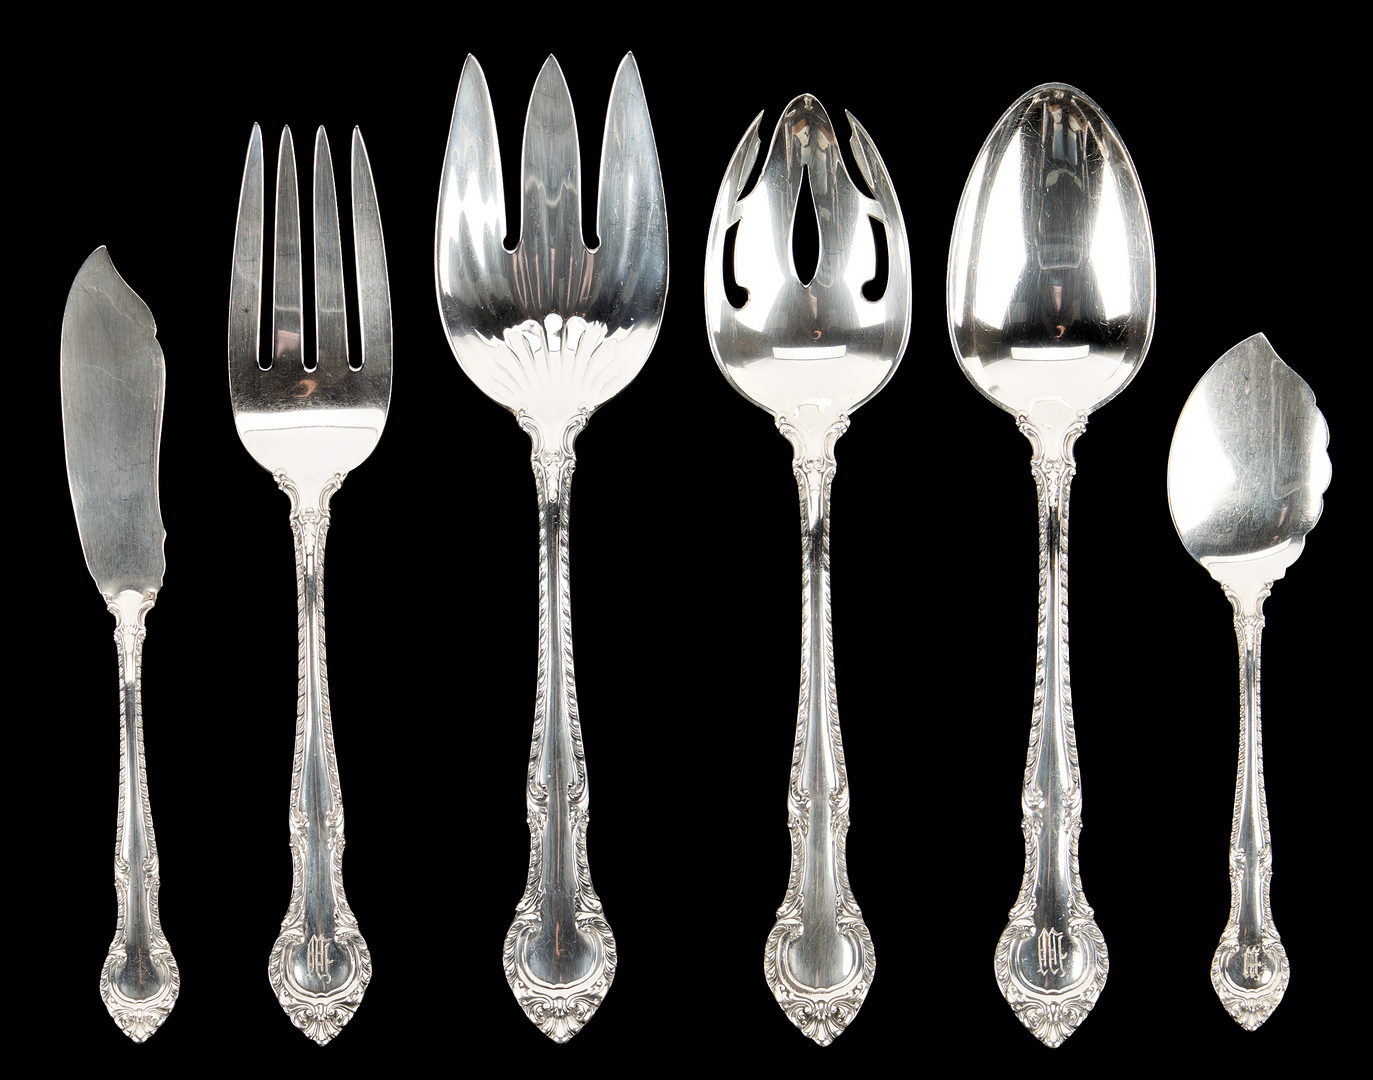 Lot 93: 144 Pcs. Gorham English Gadroon Sterling Silver Flatware